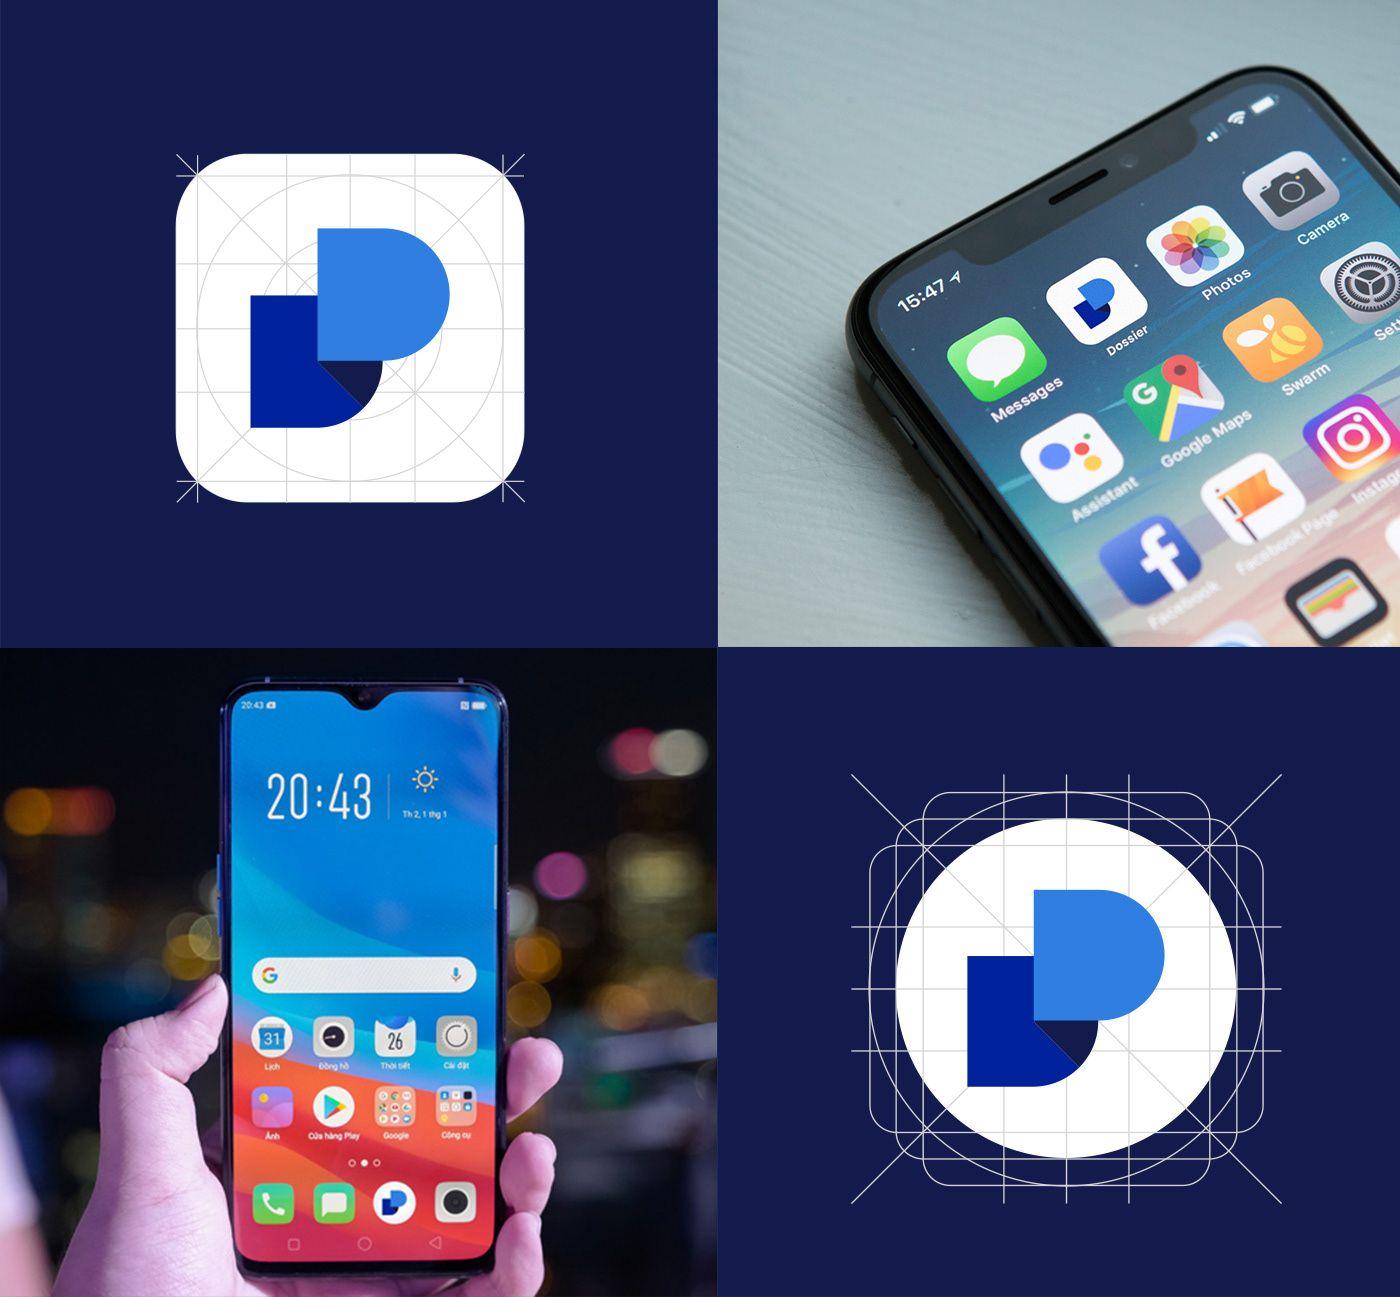 Dossier App Icon By Kanhaiya Sharma On Behance Behance